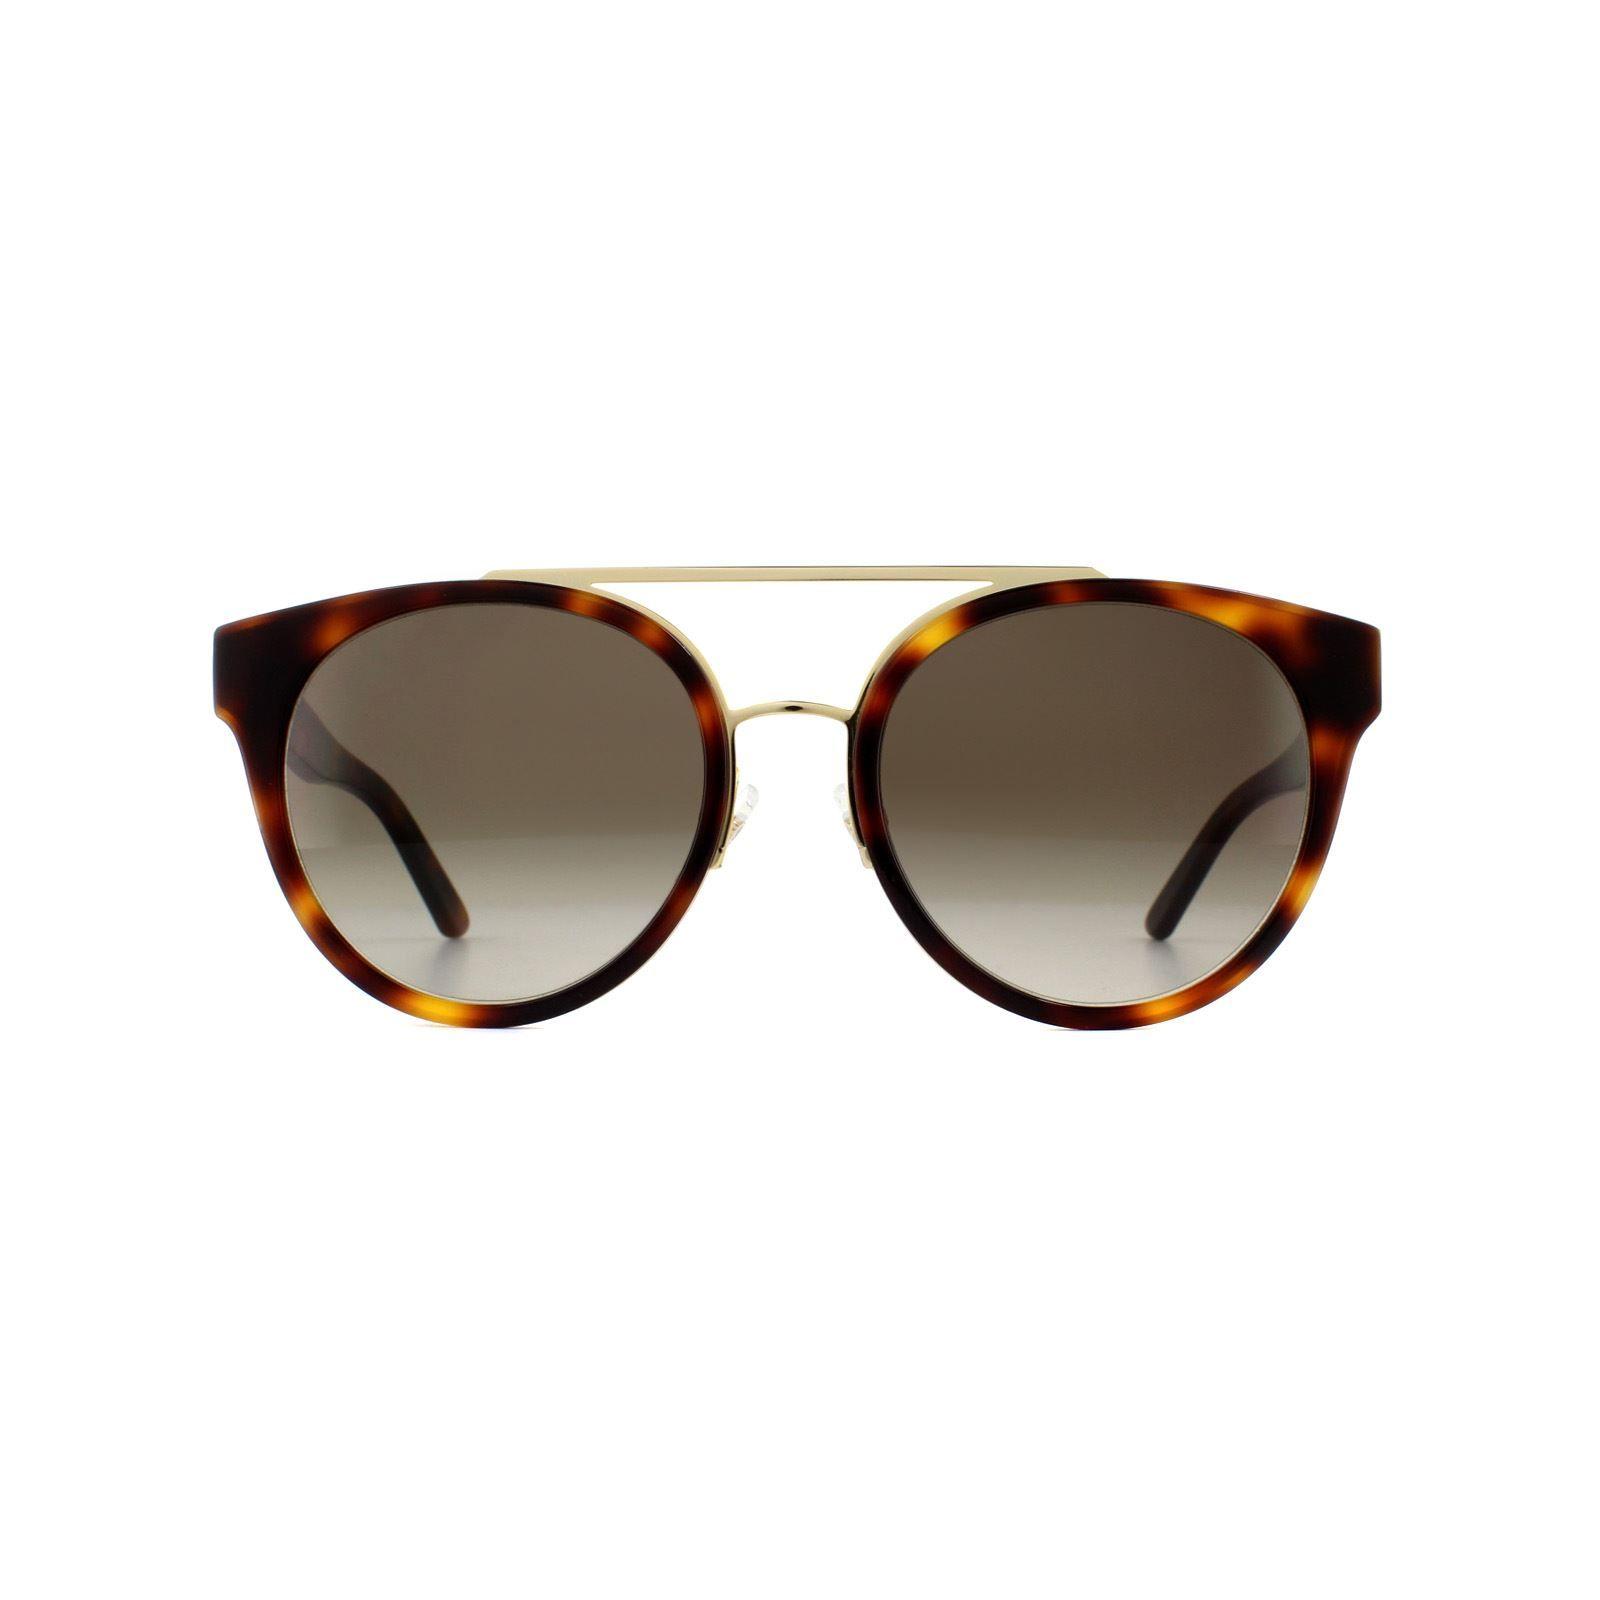 Marc Jacobs Sunglasses MARC 80/F/S 05L HA Havana Brown Gradient